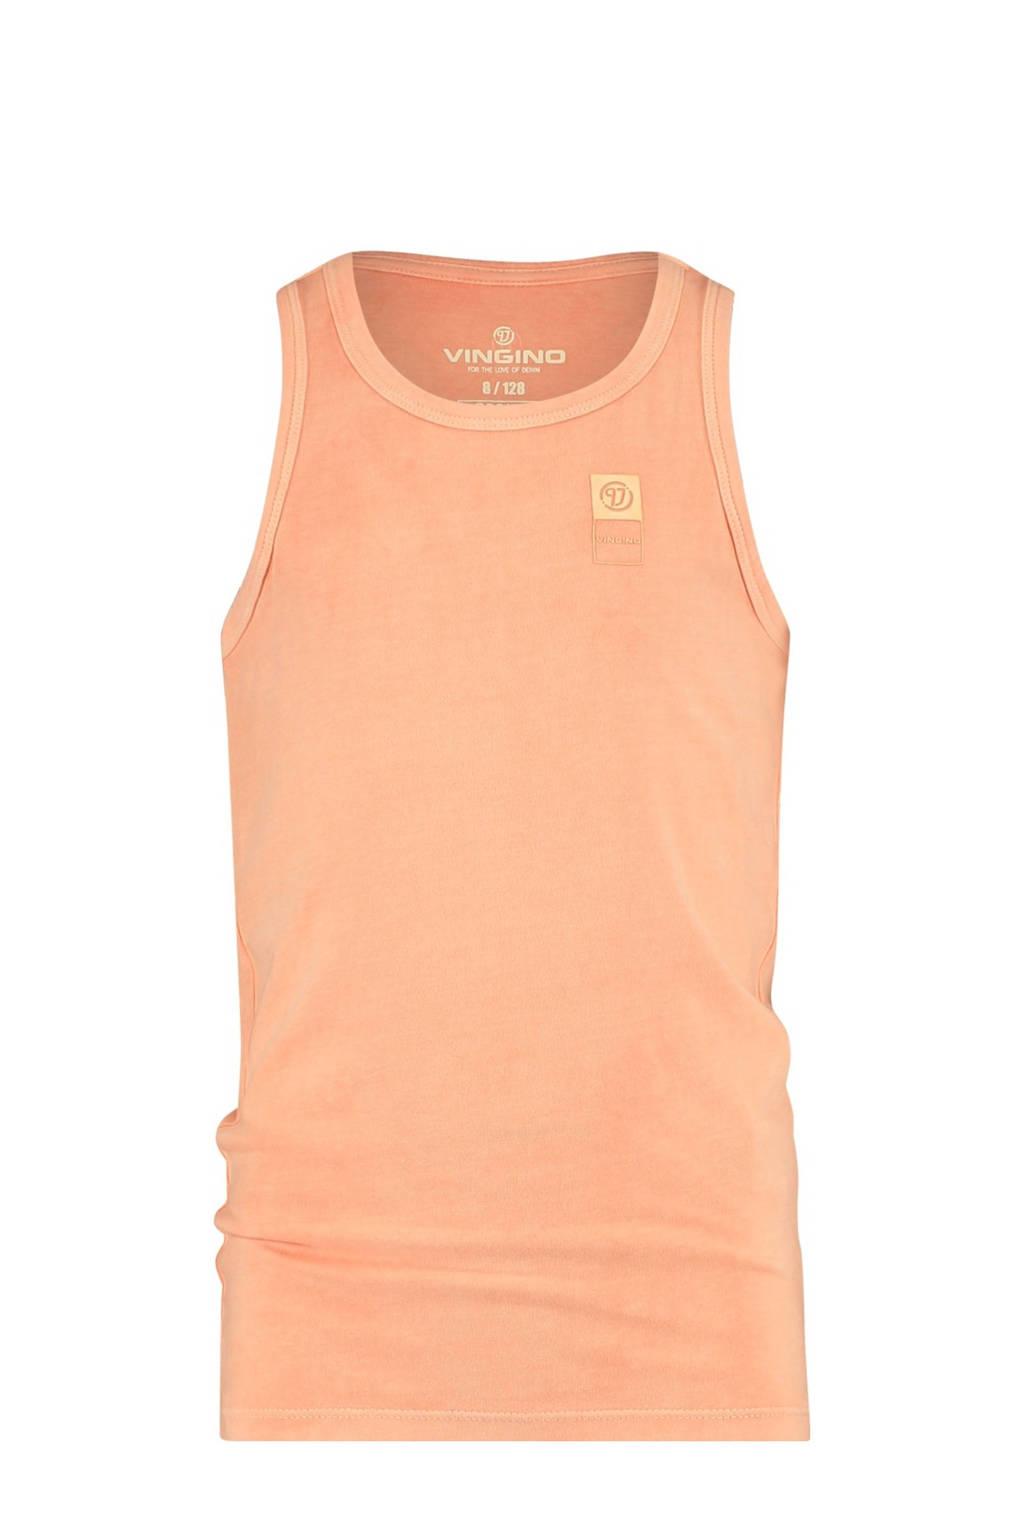 Vingino Essentials singlet neon oranje, Neon oranje